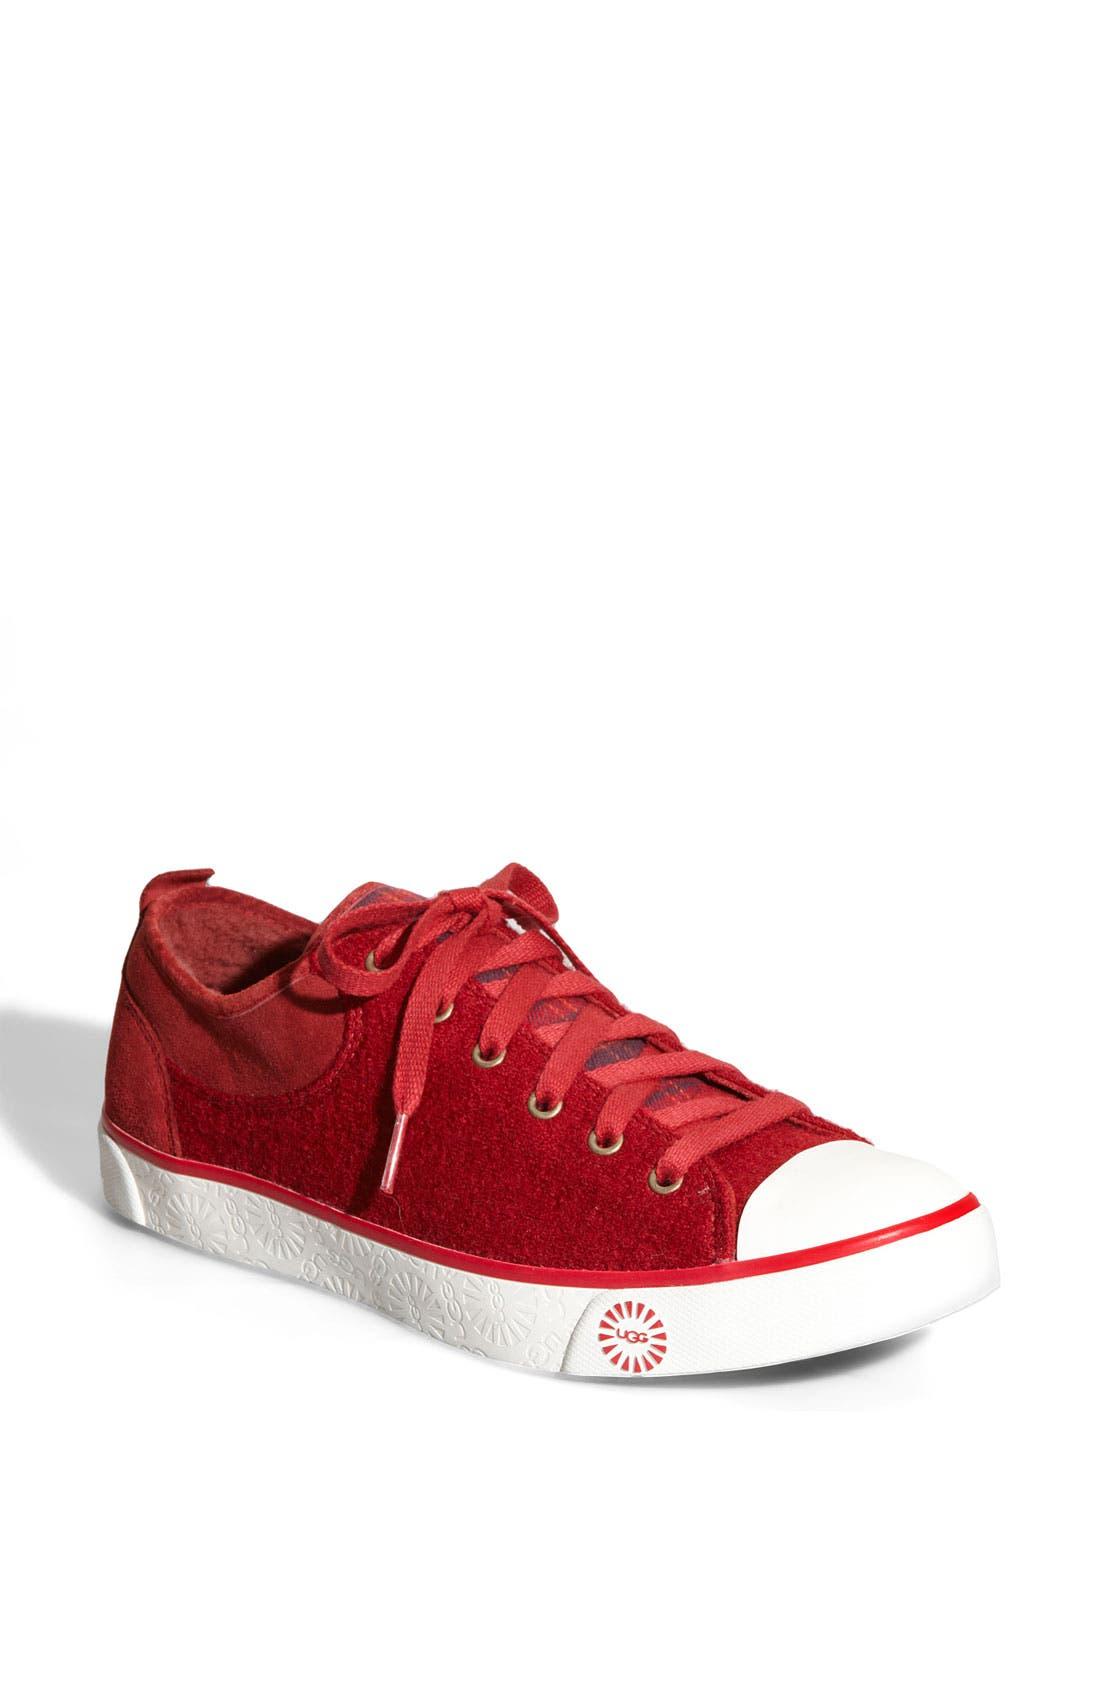 UGG<SUP>®</SUP> Australia 'Evera' Suede Sneaker, Main, color, 003